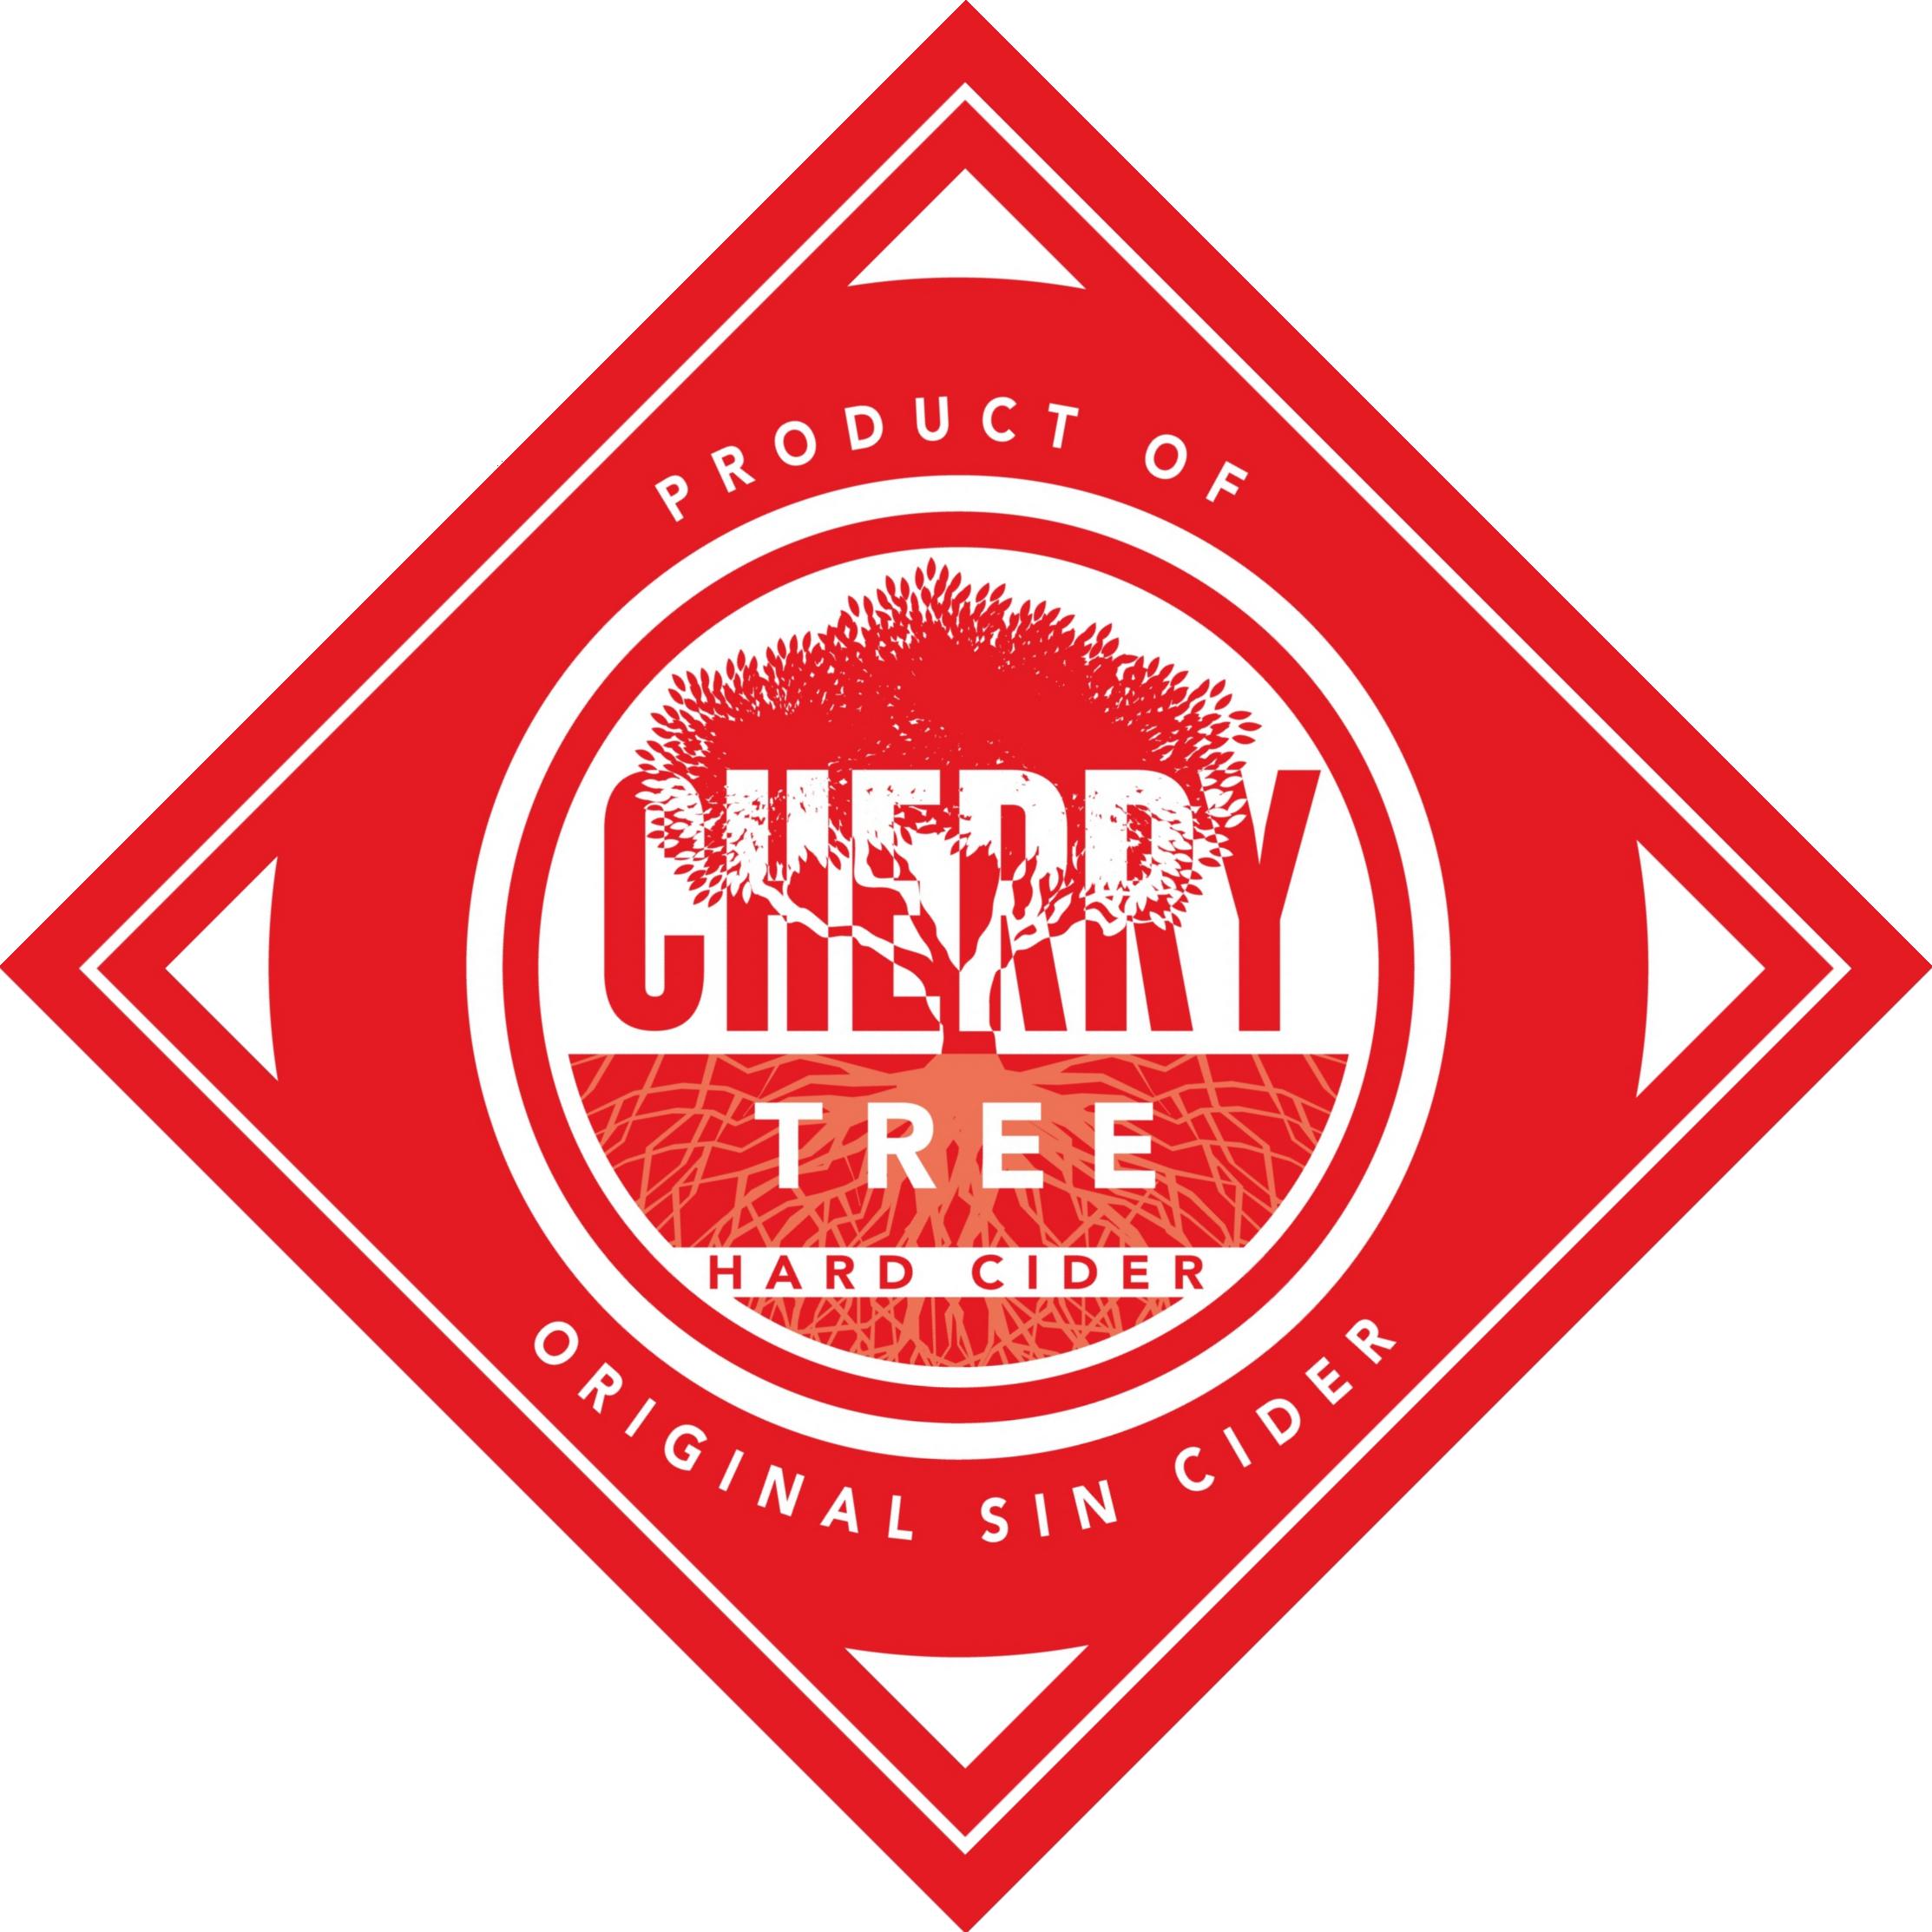 Original Sin Cherry Tree Cider